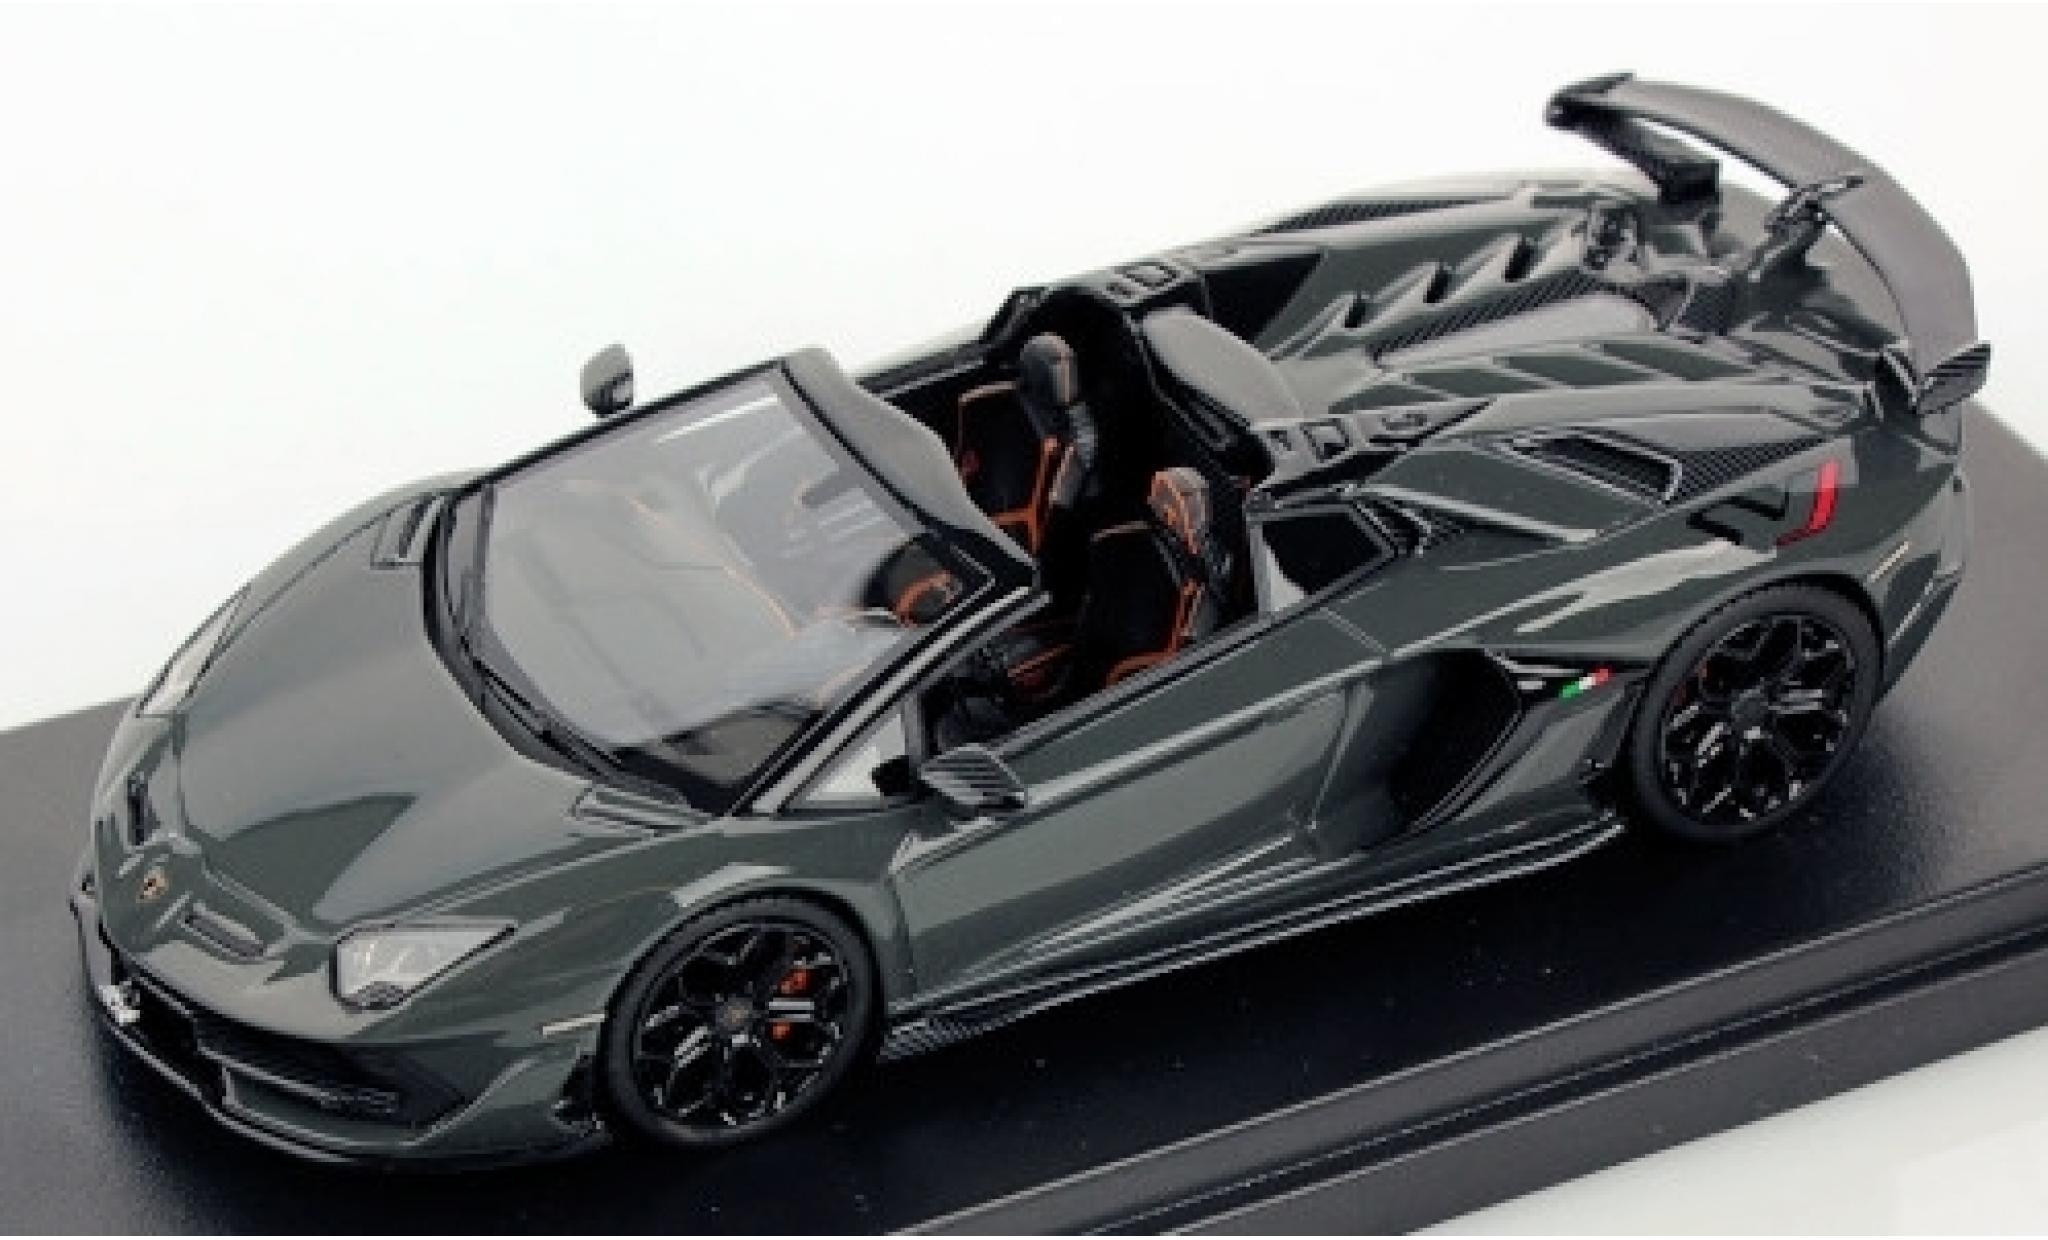 Lamborghini Aventador 1/43 Look Smart SVJ Roadster metallise grey 2019